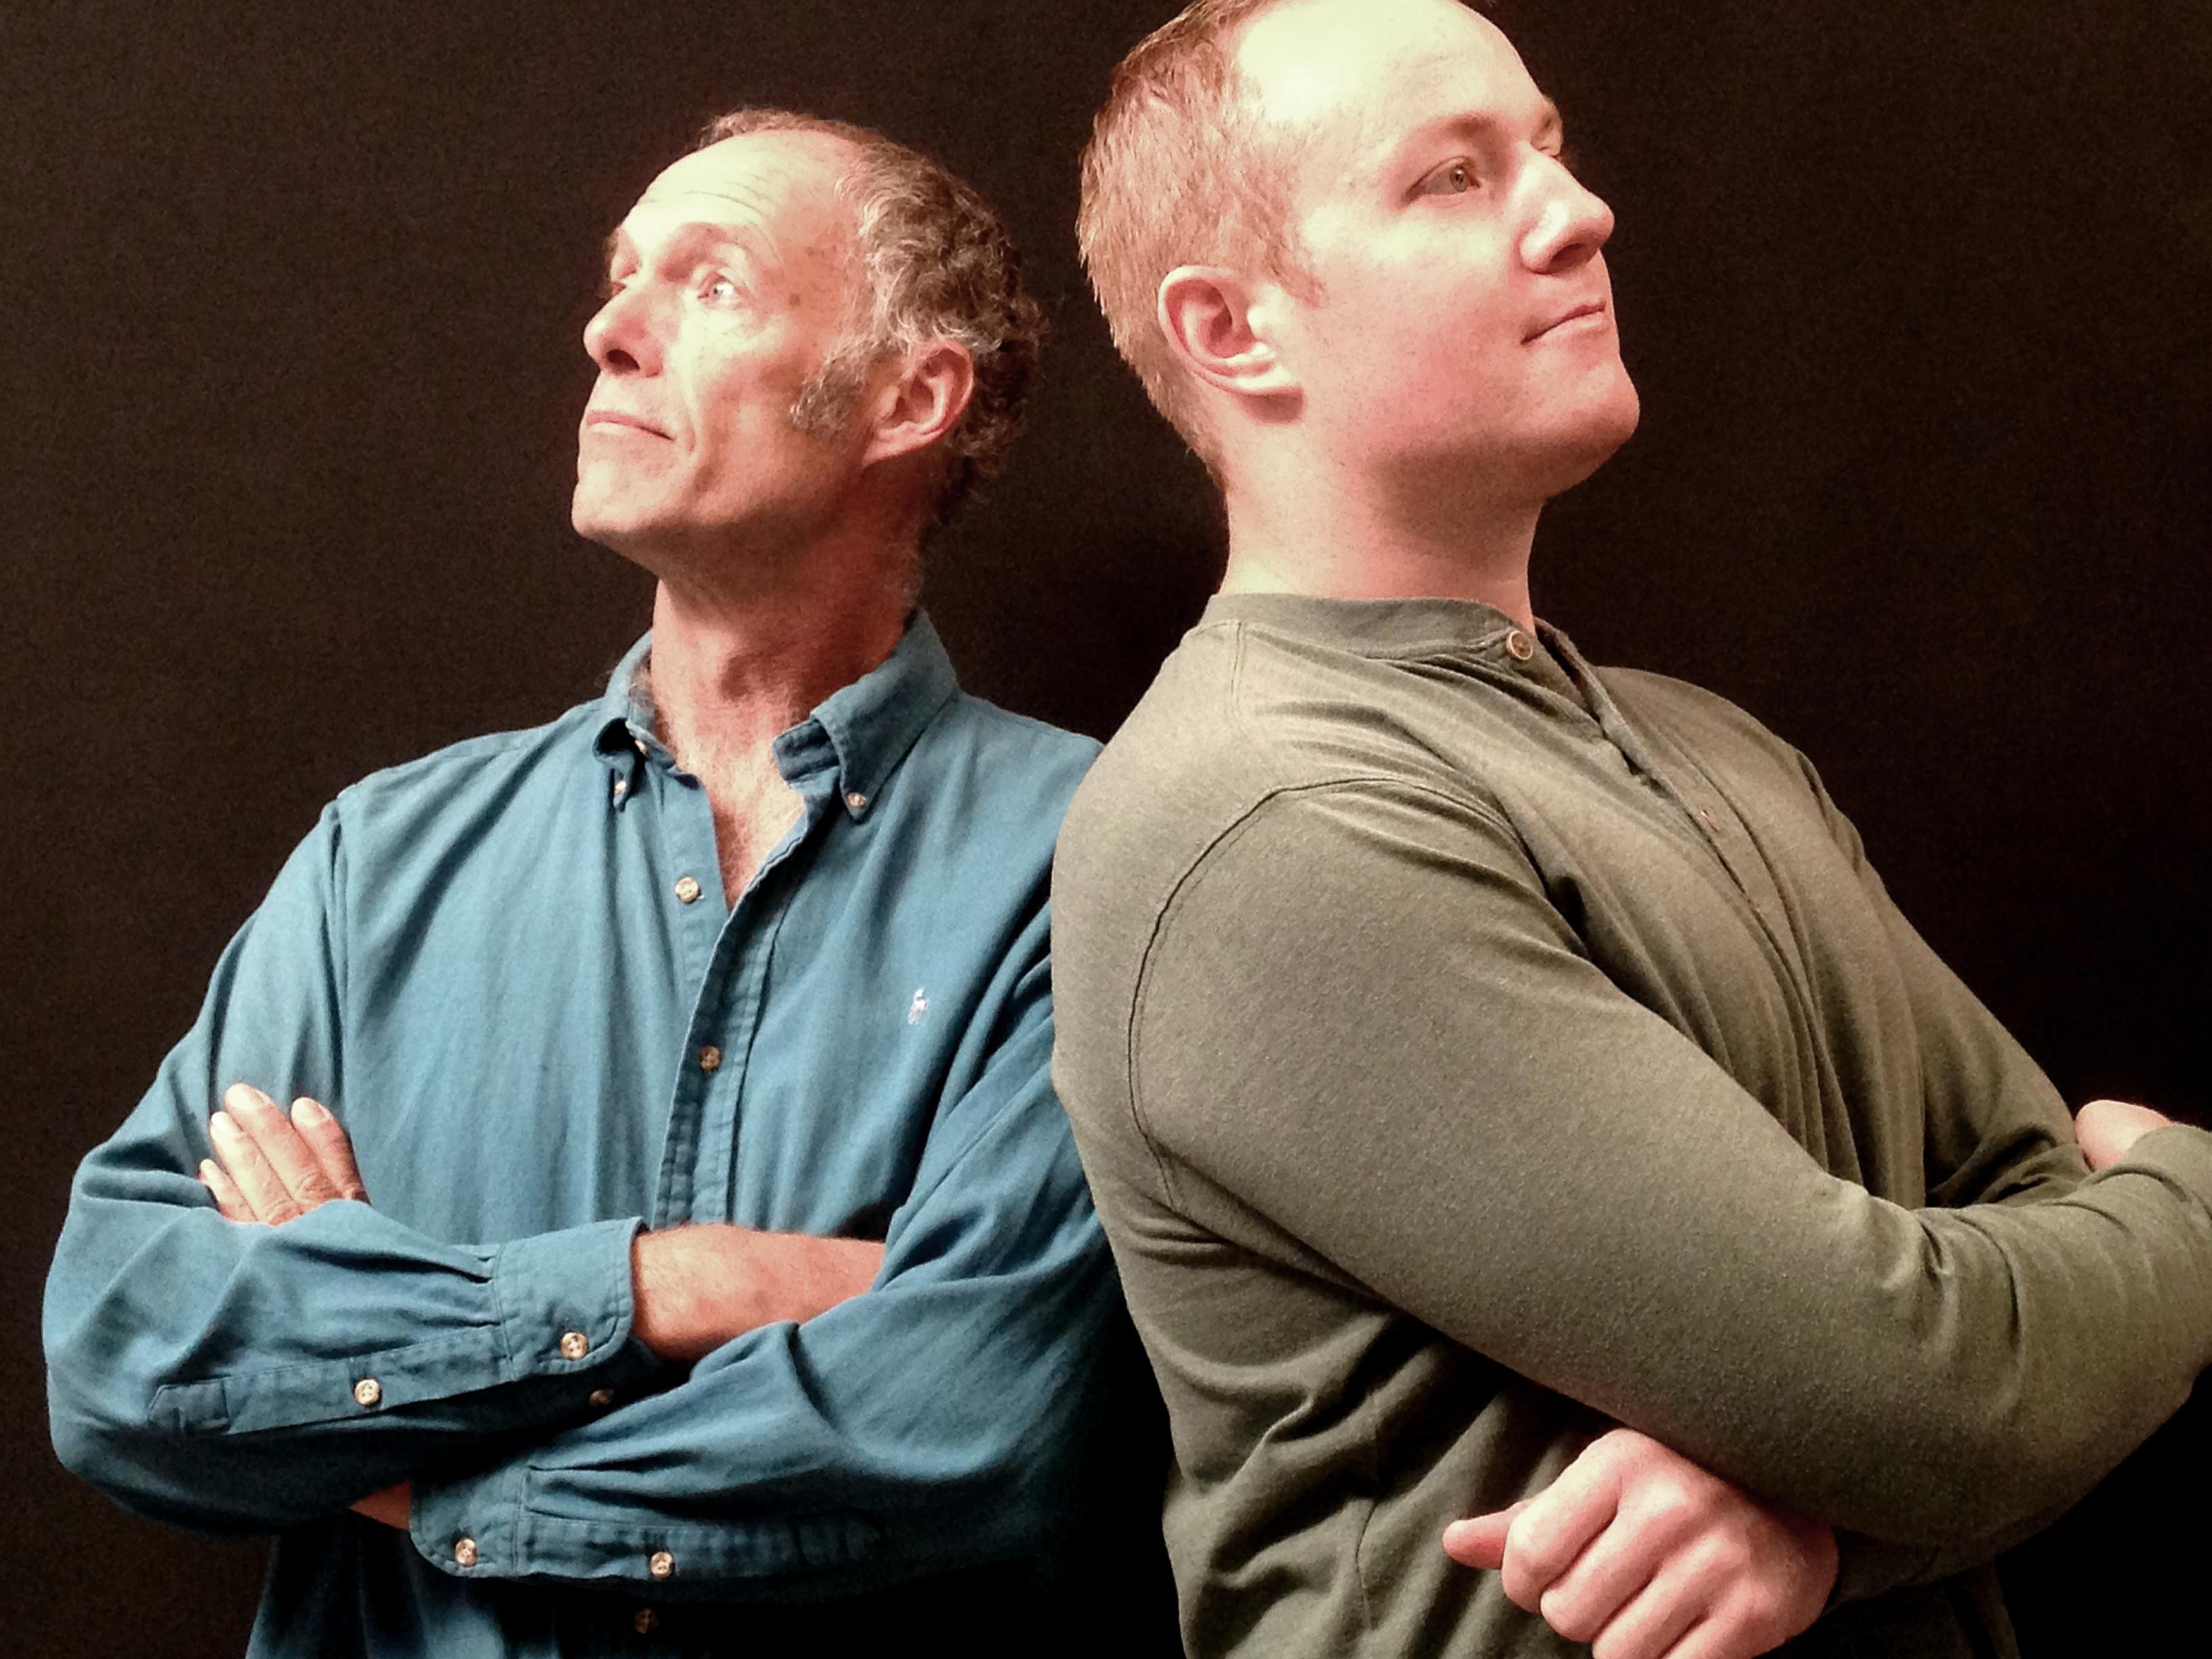 Tim Holmes and Garret Garrels combine art, storytelling and comedy.